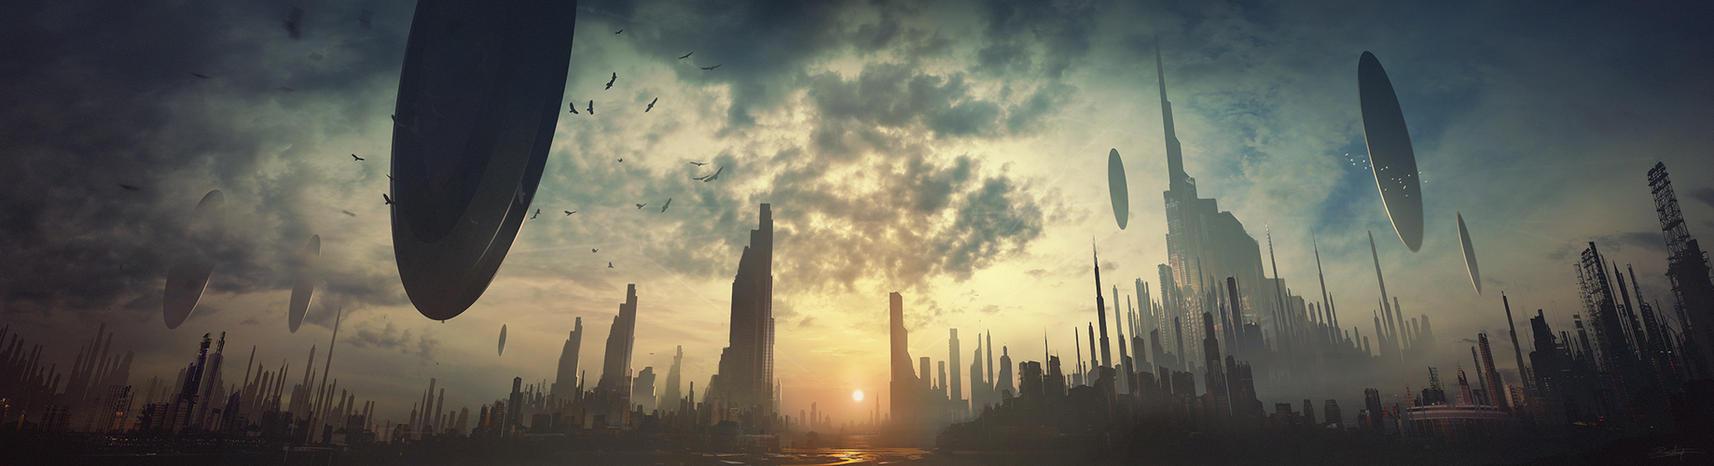 Last rays by Grivetart